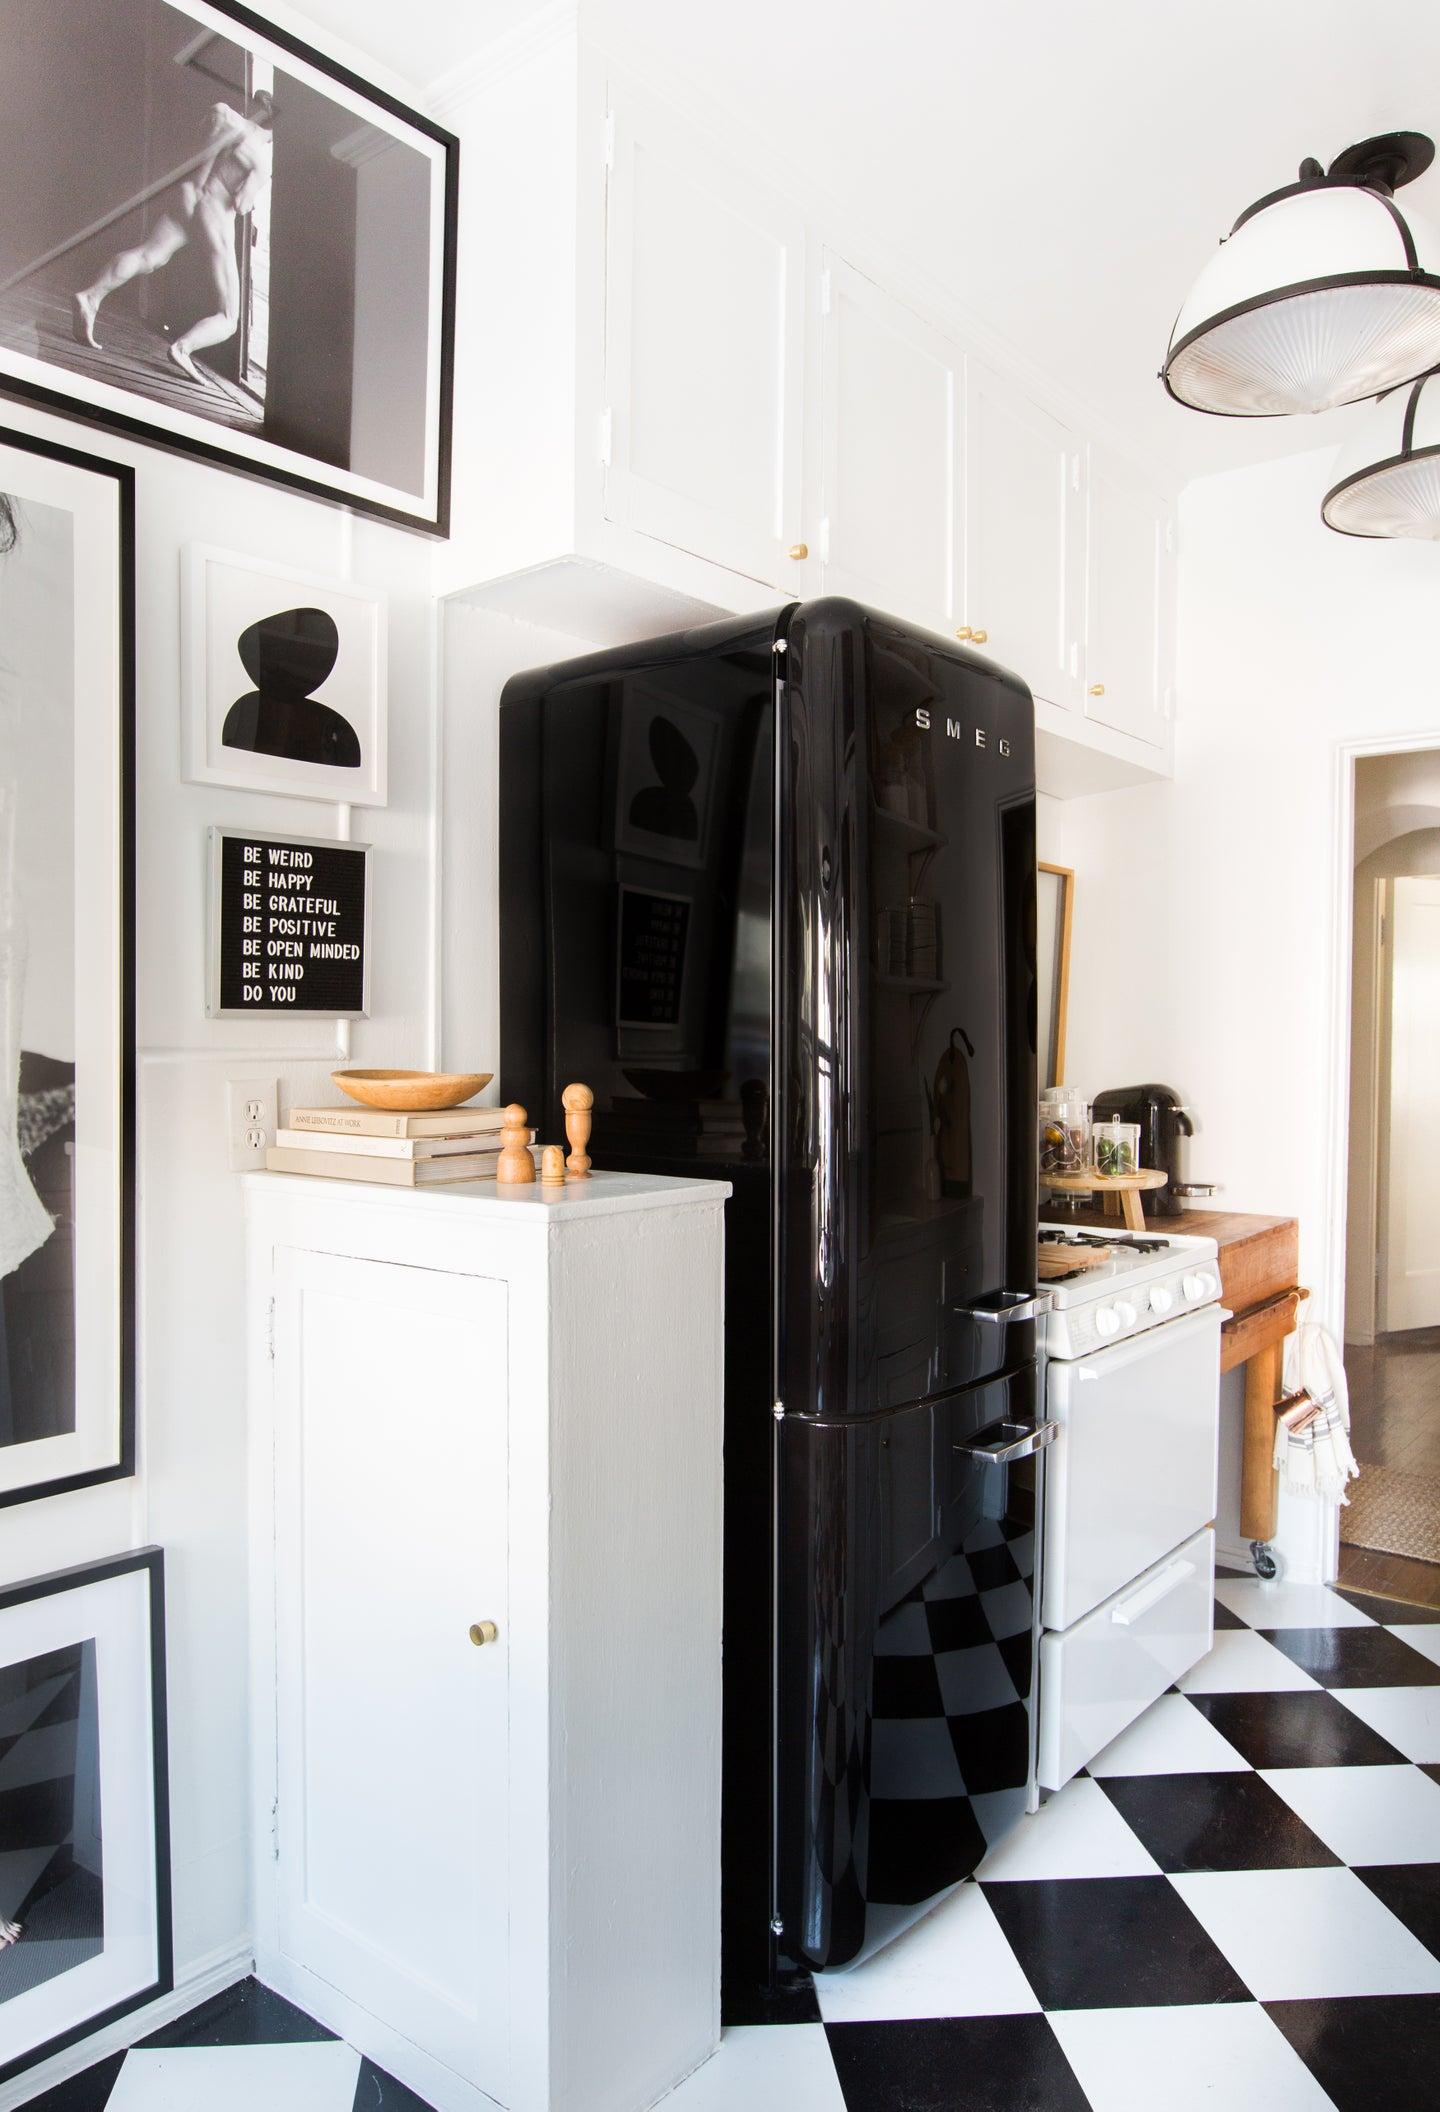 black fridge with balck and white checkered floors